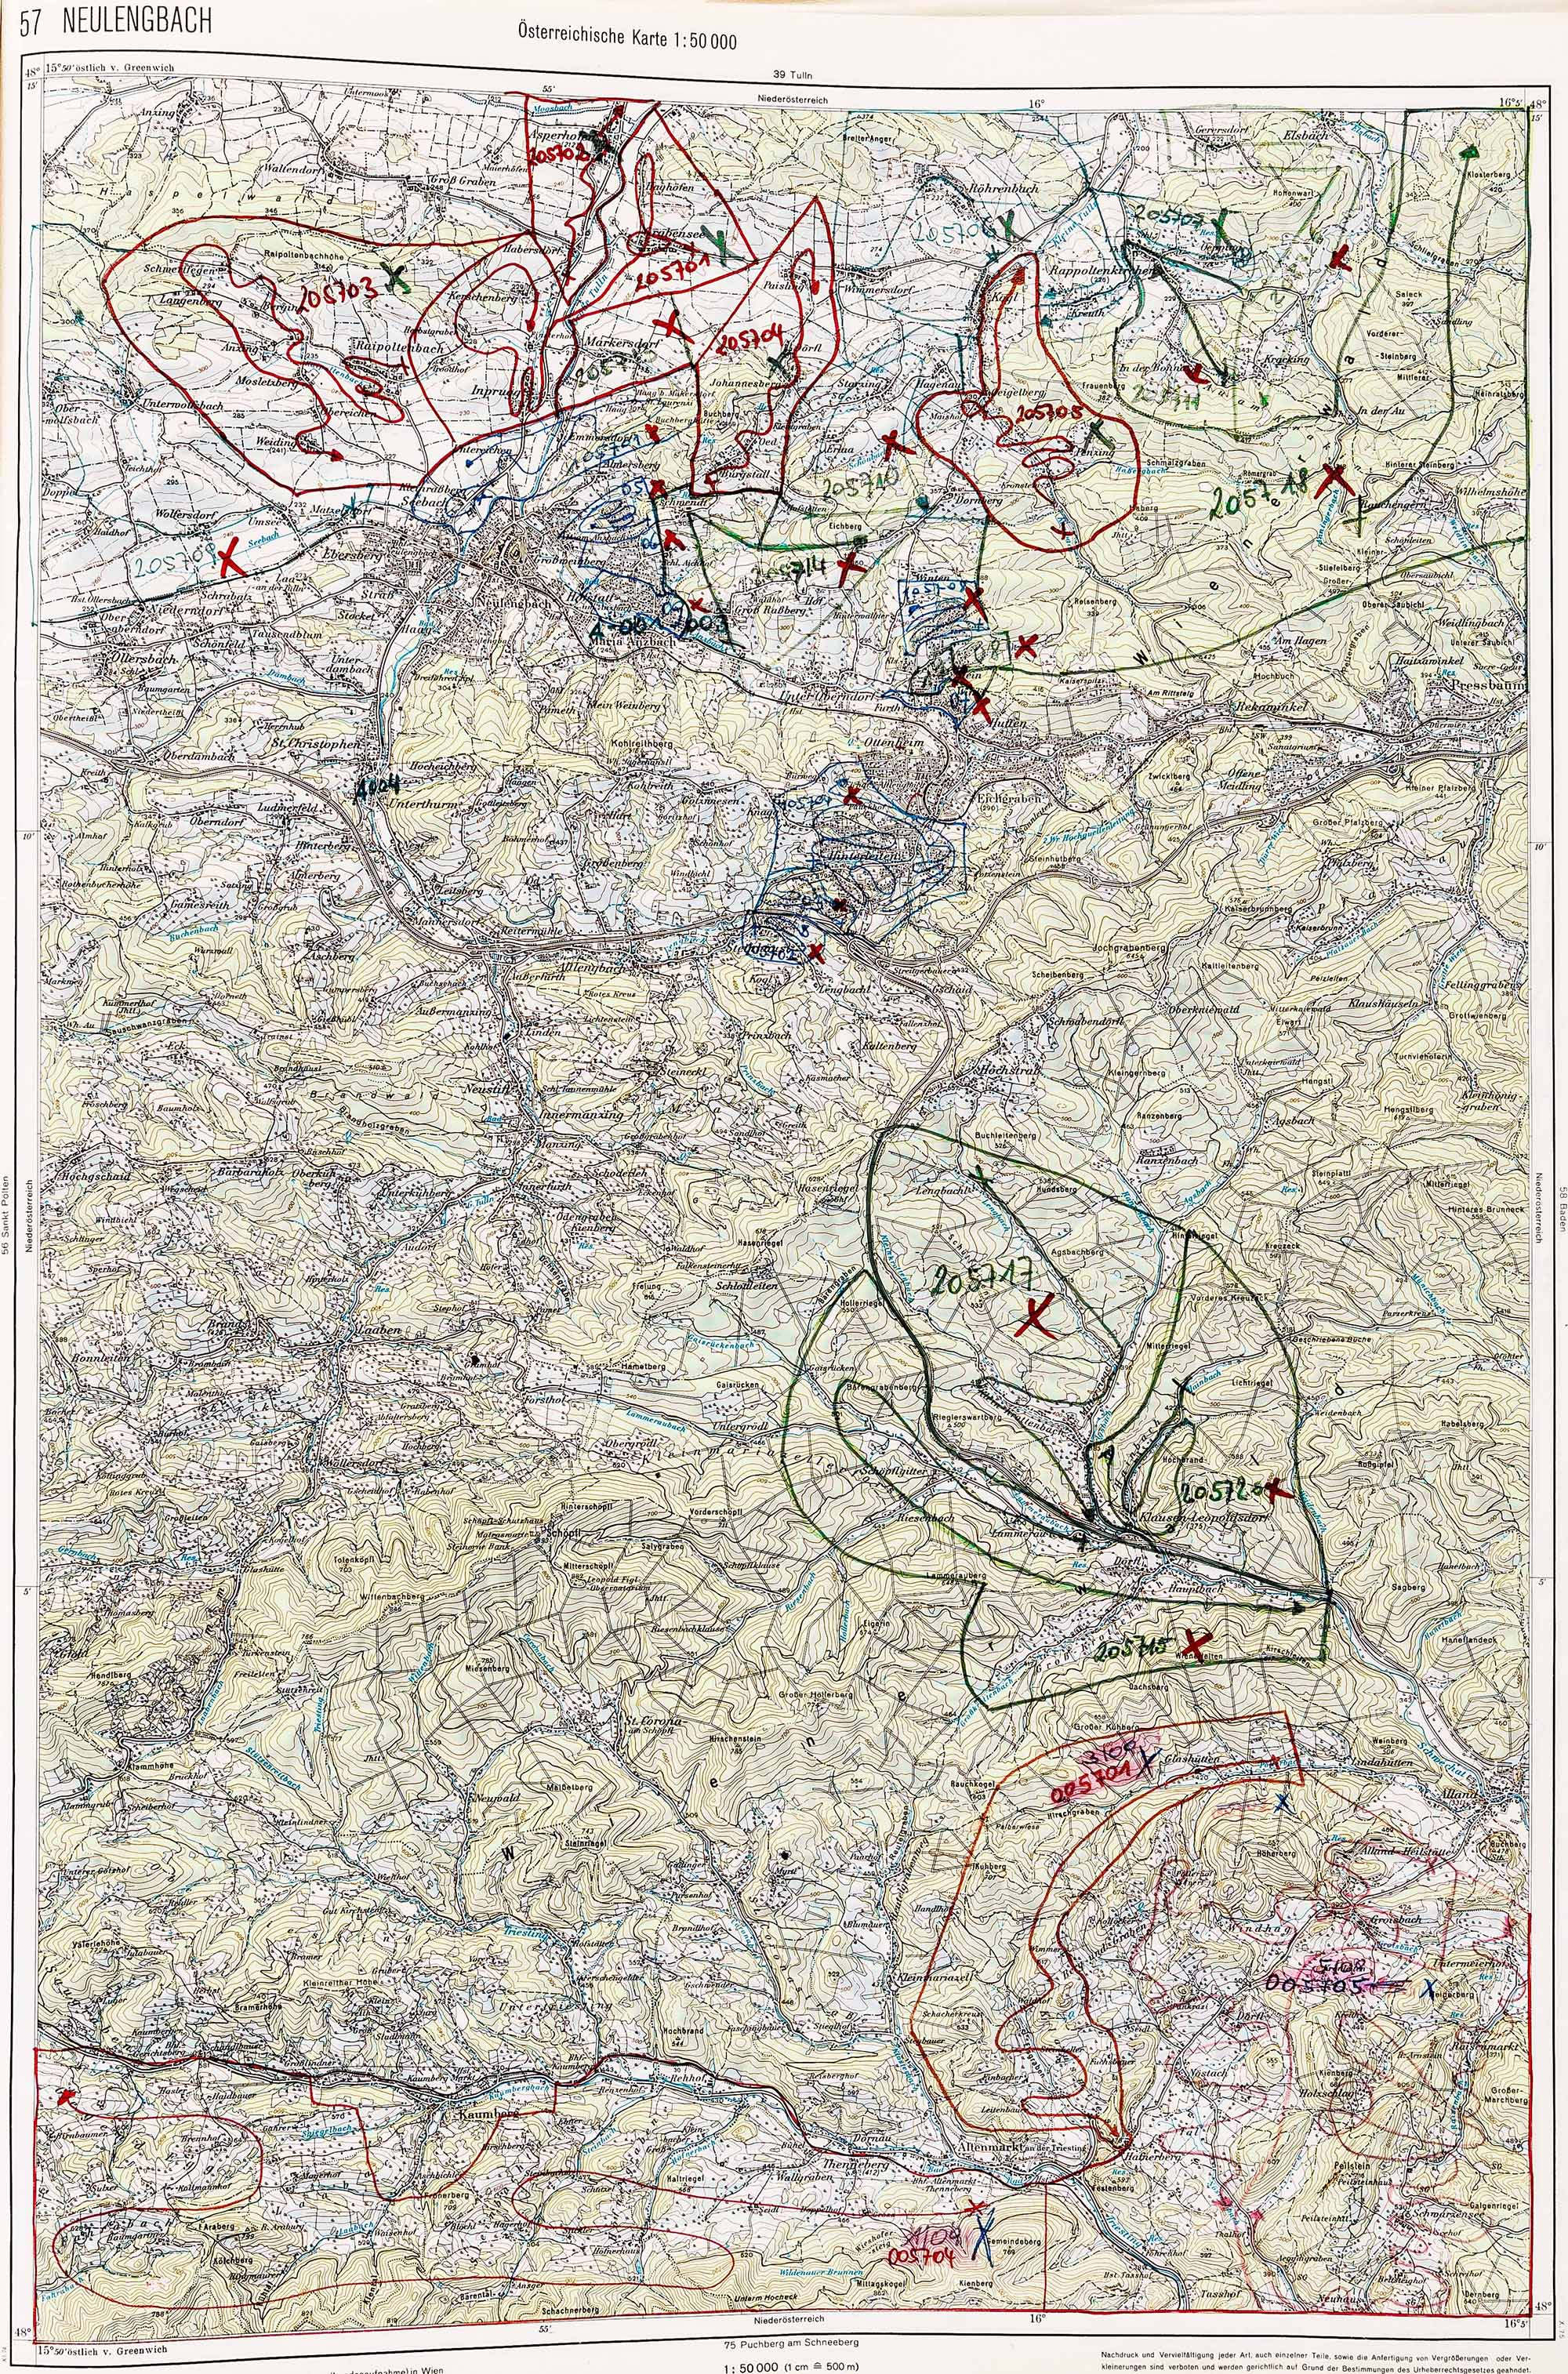 1979-1982 Karte 057